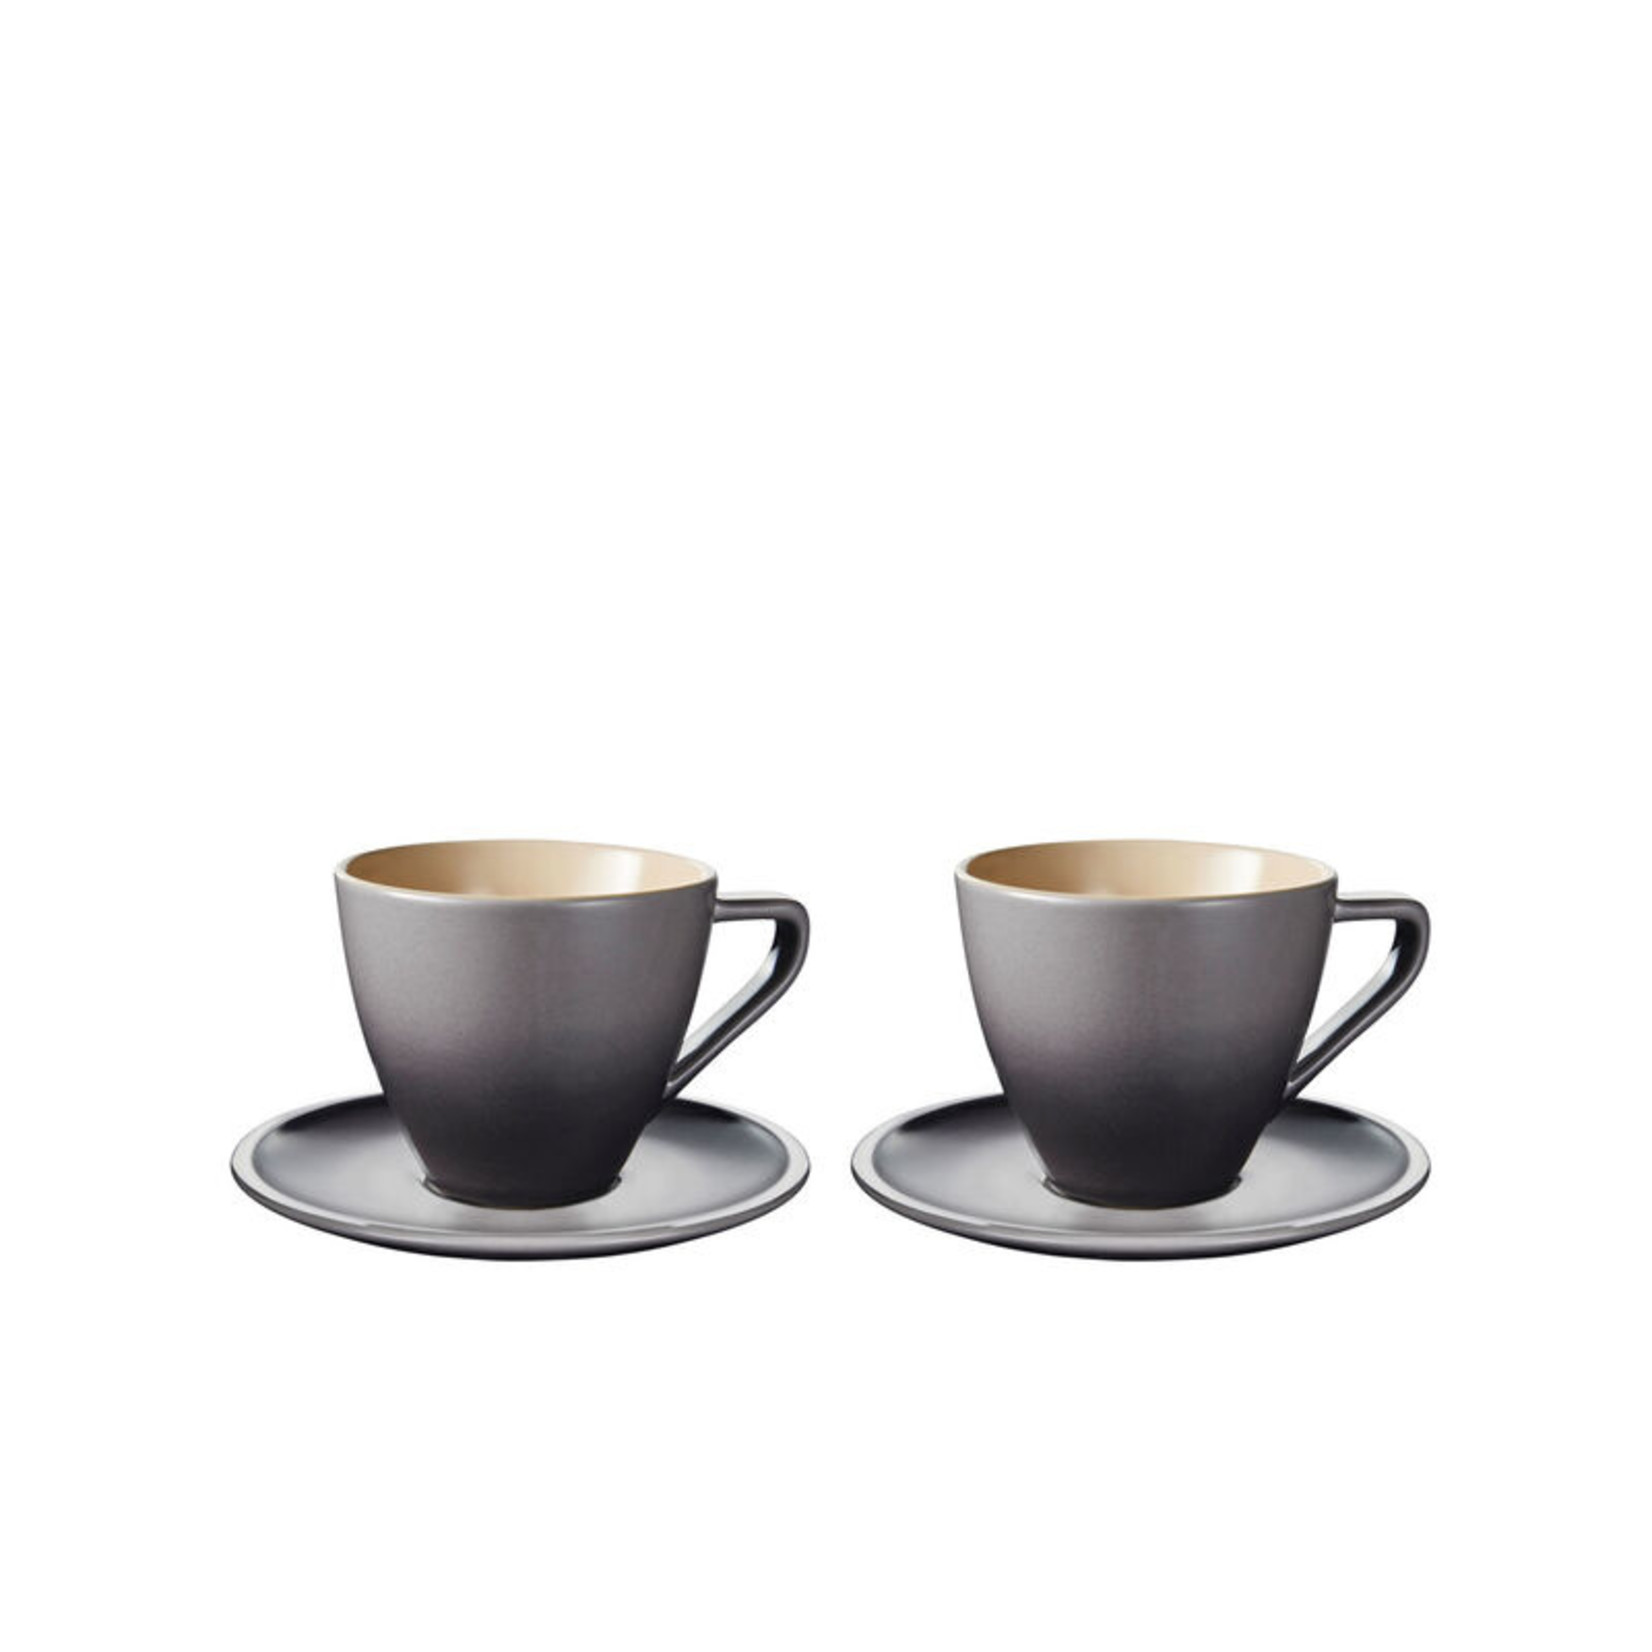 Le Creuset Set of Minimalist Cappuccino Cups